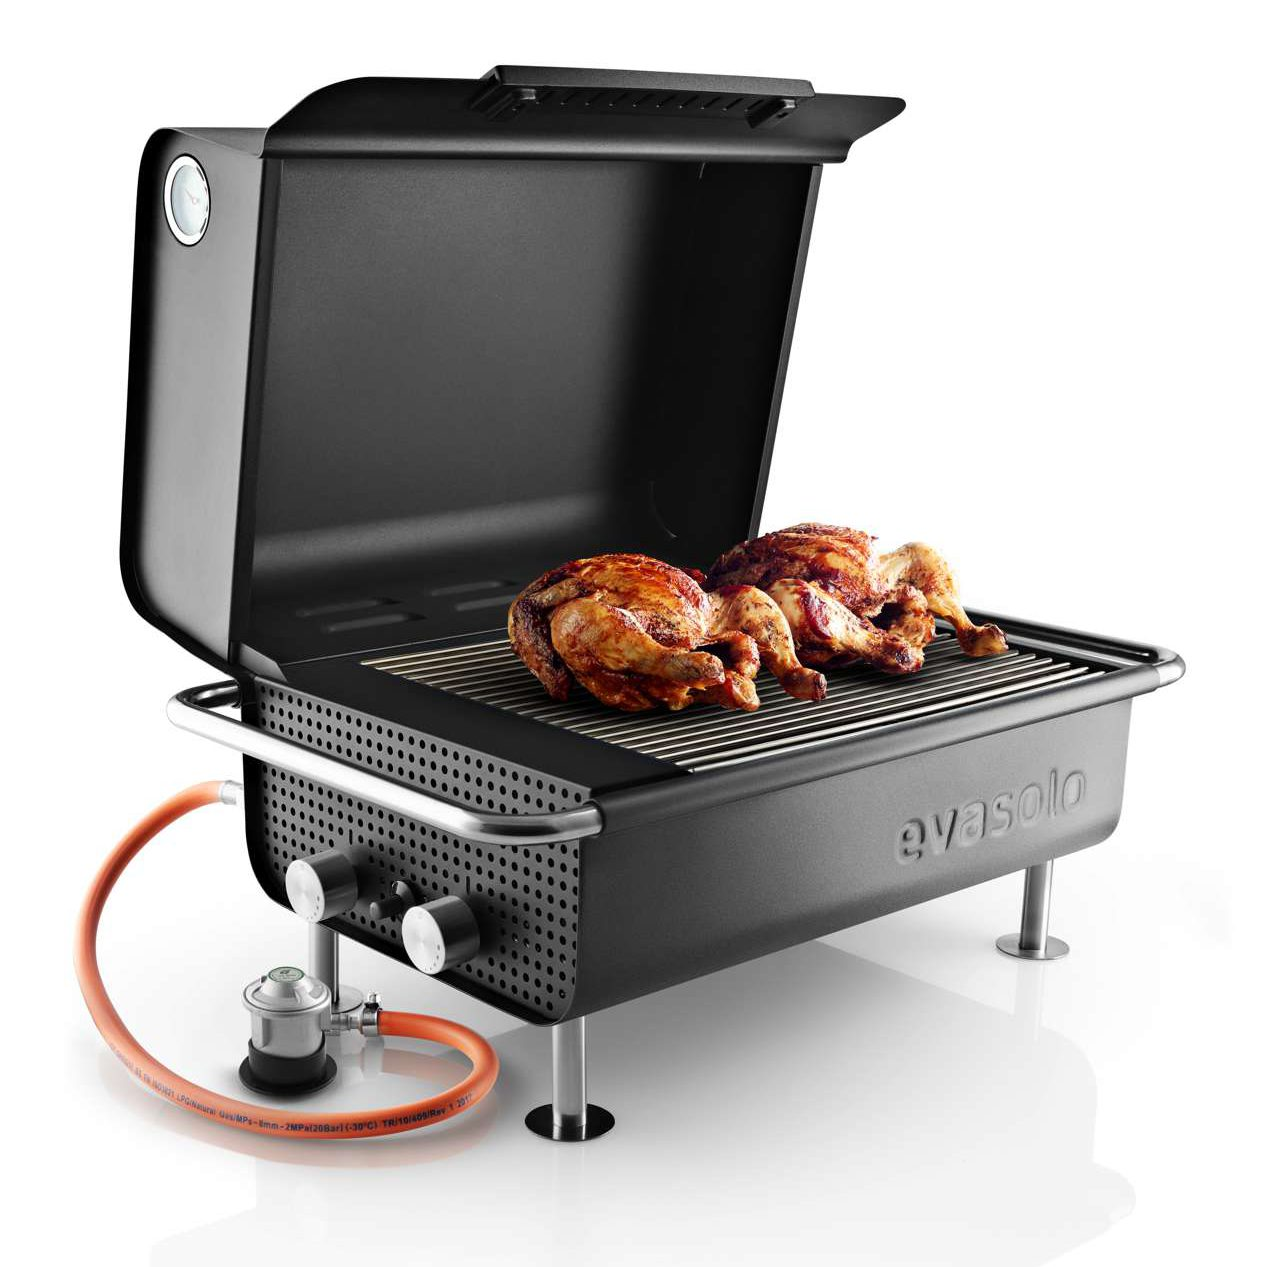 Grill Fur Die Kuche Born To Cook S Xxl Koch Koche Hobby